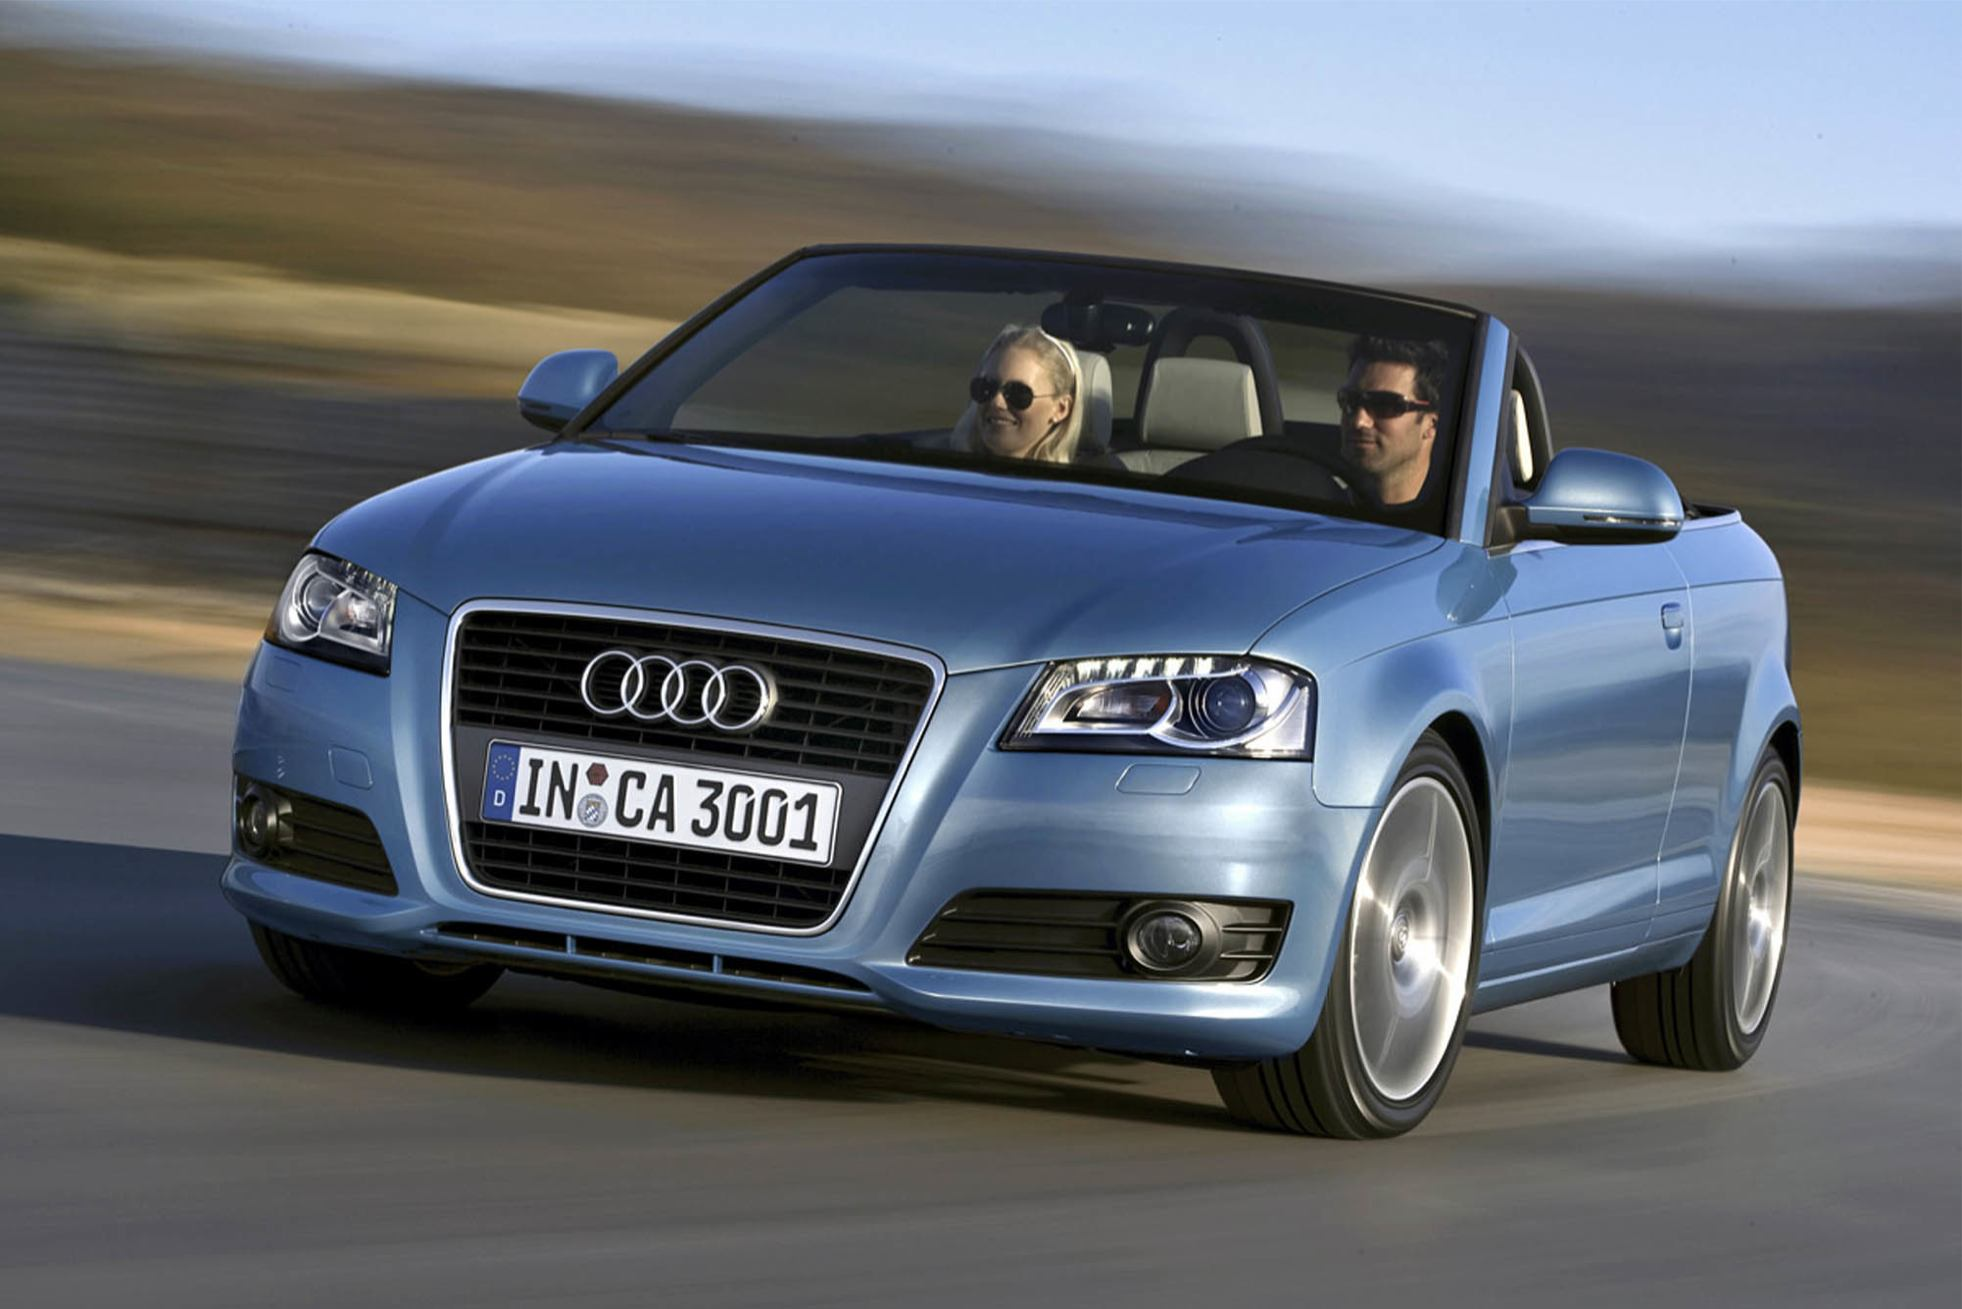 Audi A3-Cabriolet photo